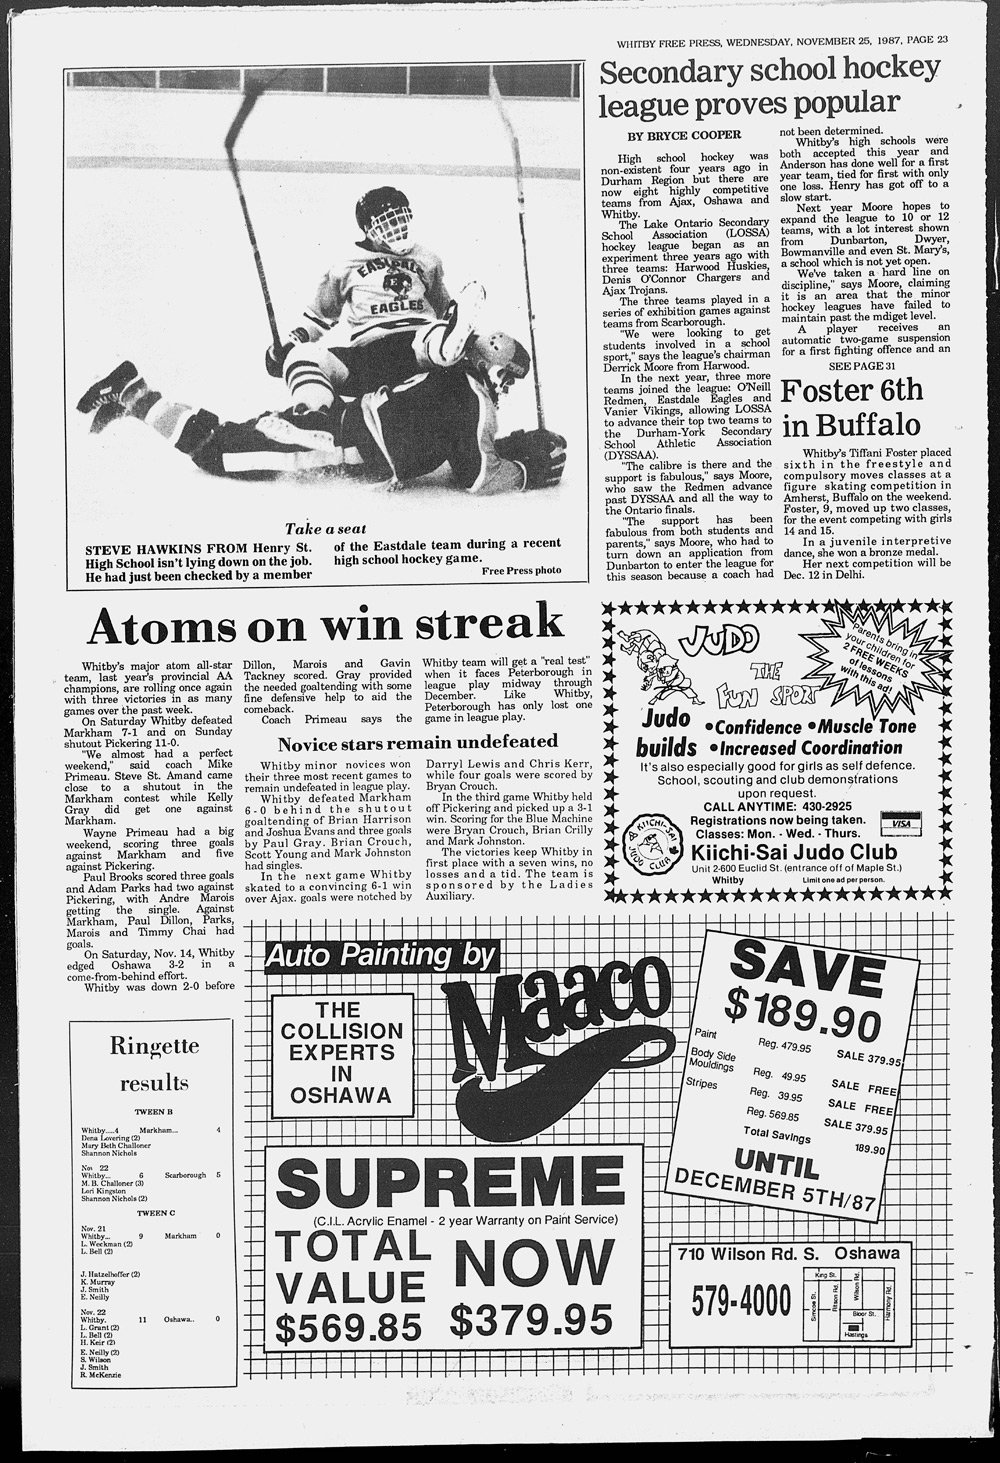 Whitby Free Press, 25 Nov 1987